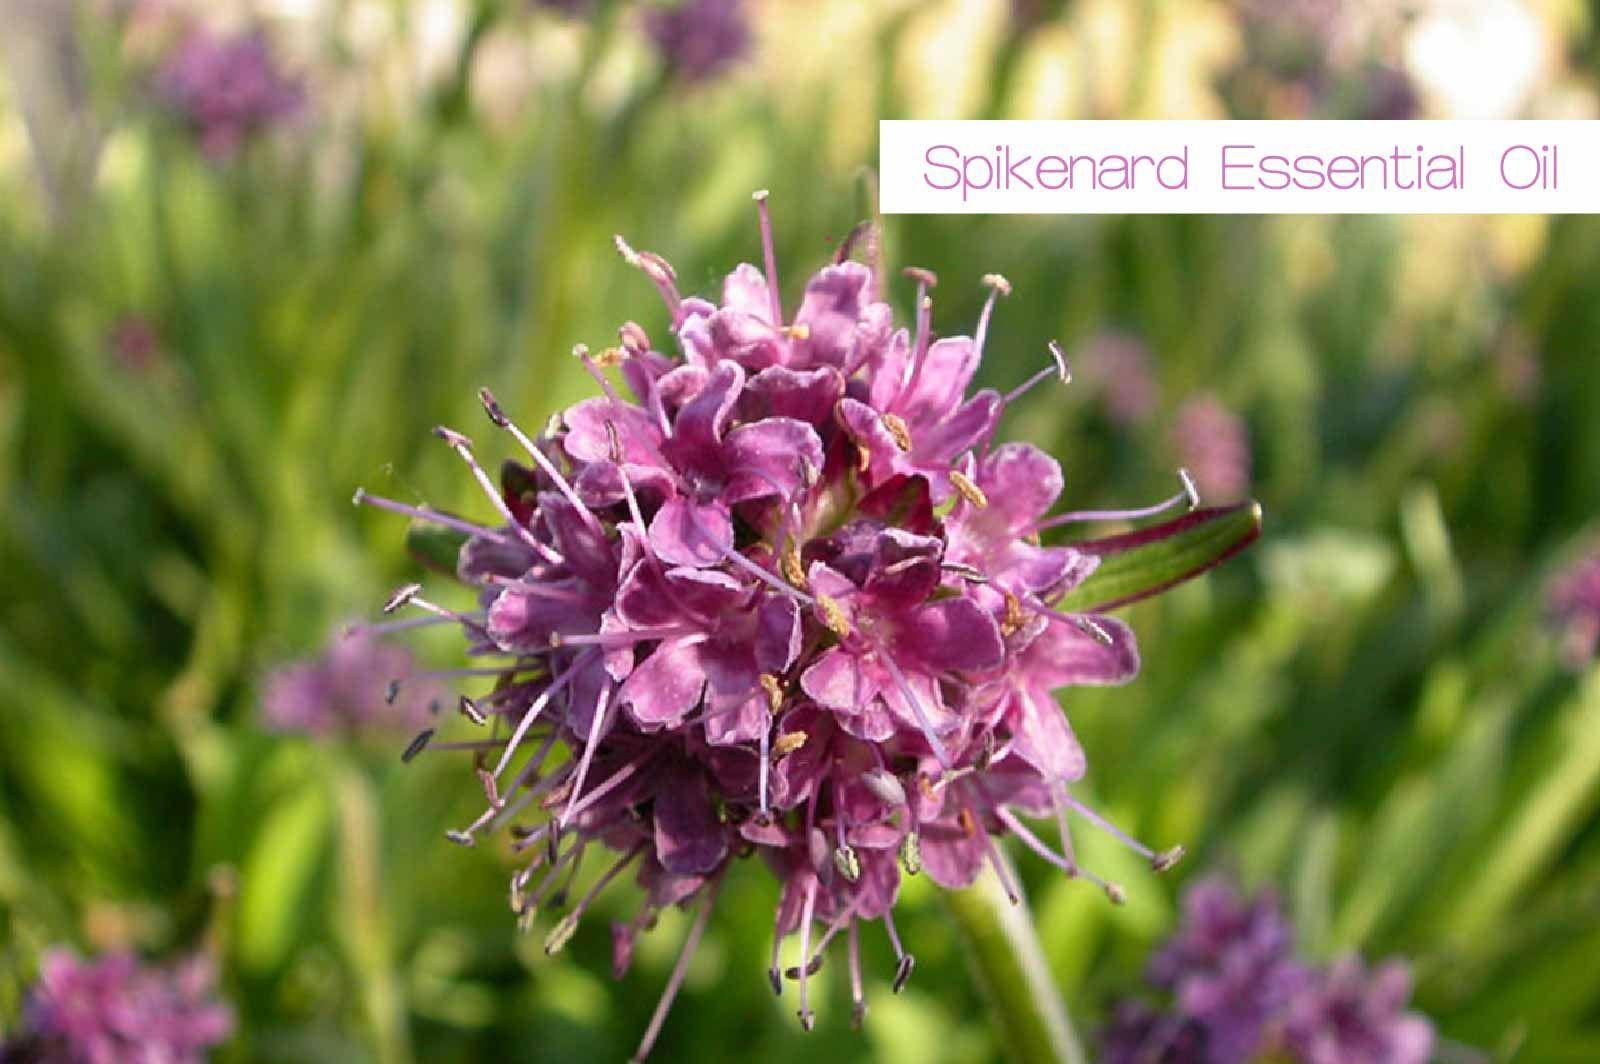 氣味獨特的穗甘松精油 Aromatic Plant Essential Oils Bible Garden